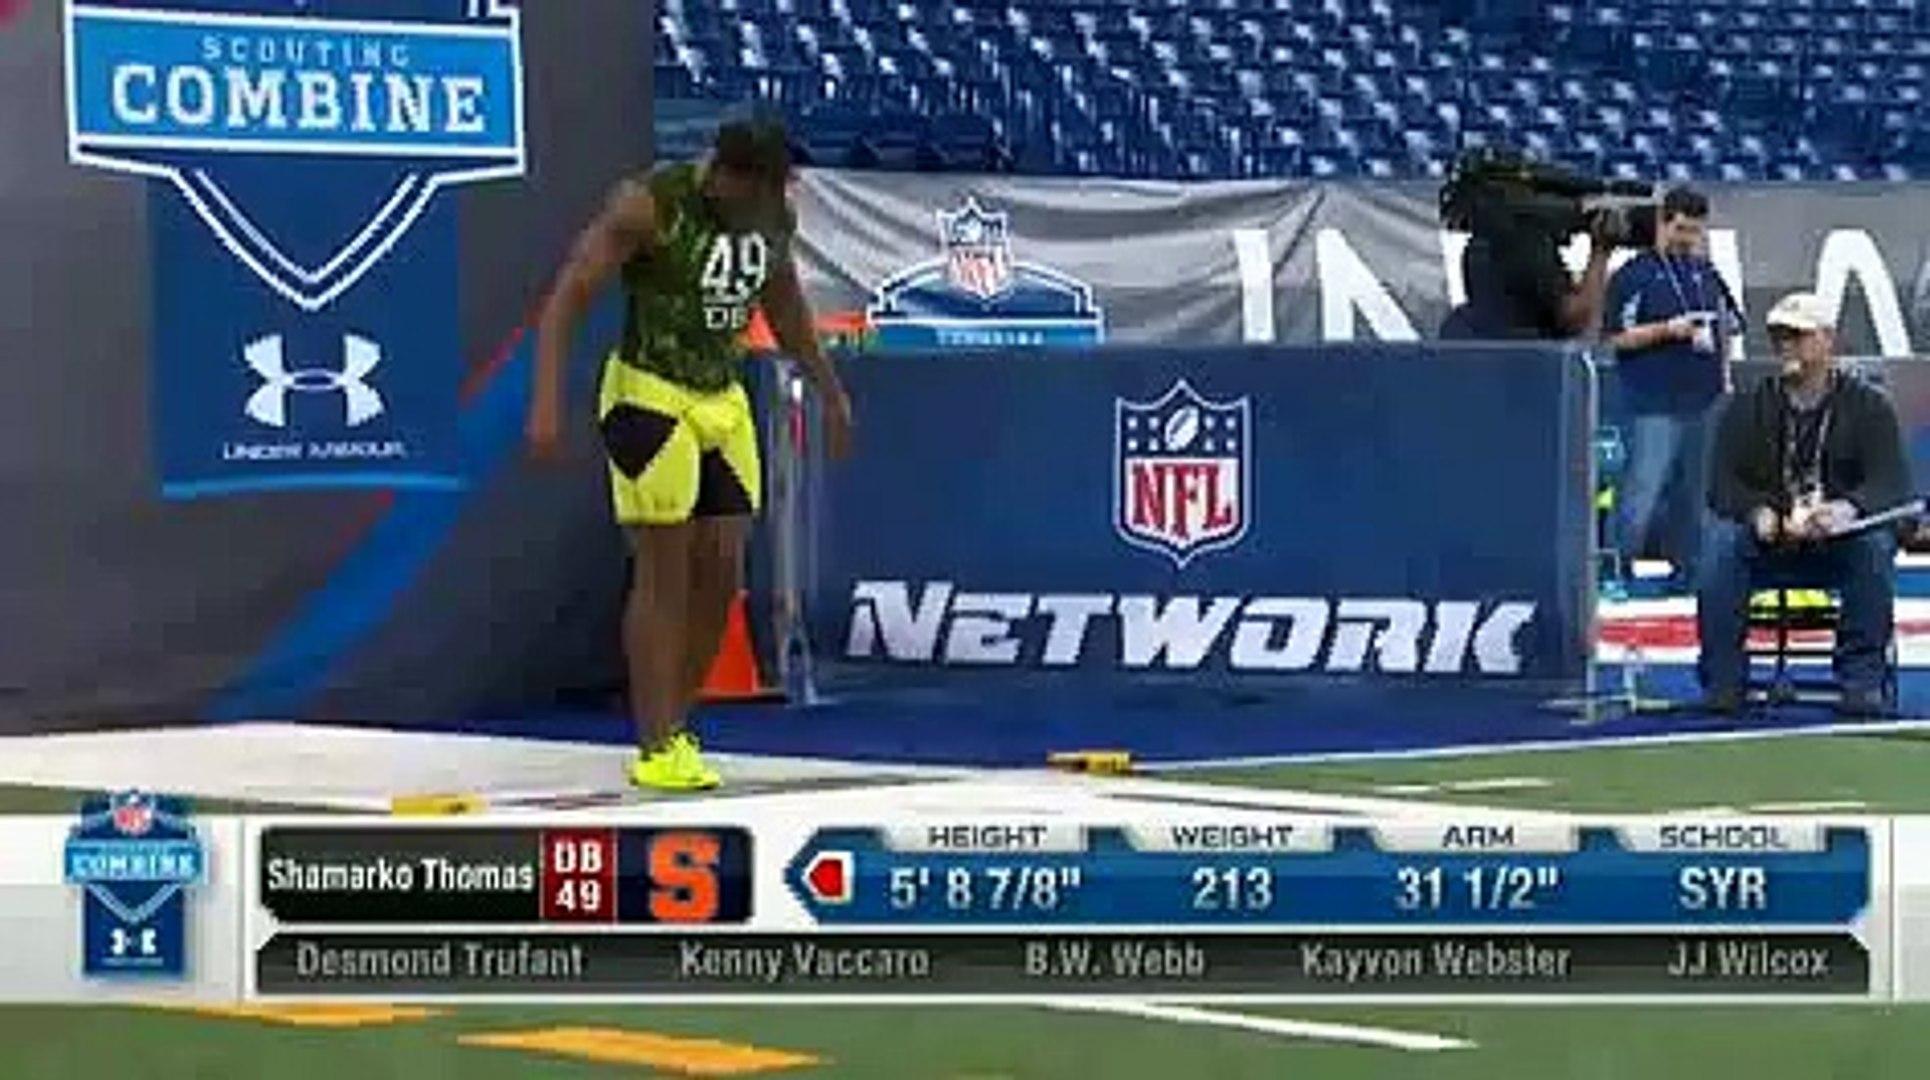 2013 NFL Combine Blooper - Shamarko Thomas Faceplants & STILL runs a 4.38 40 yard dash